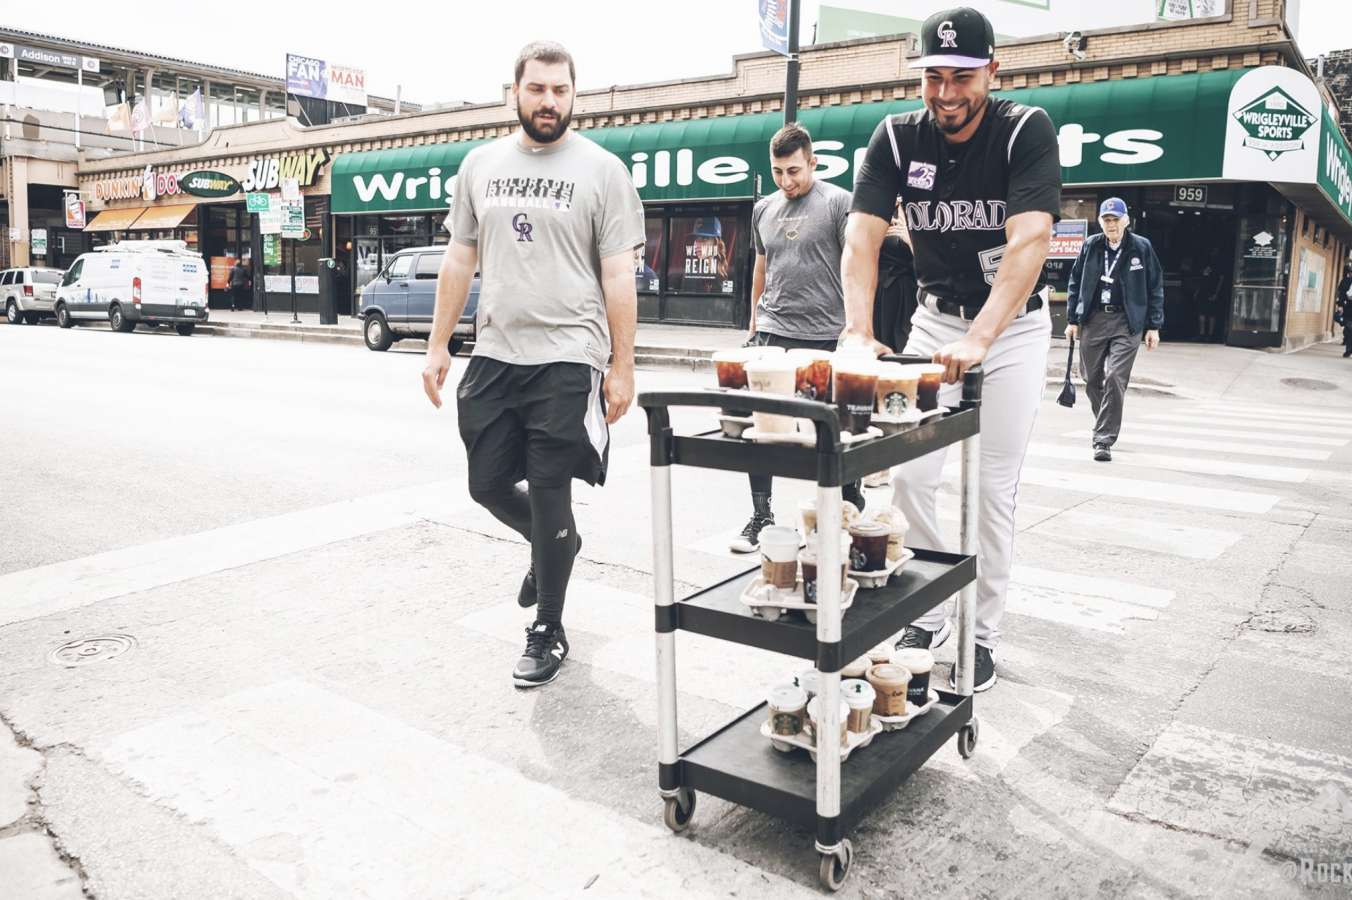 MLB rookie sent on coffee run in full uniform